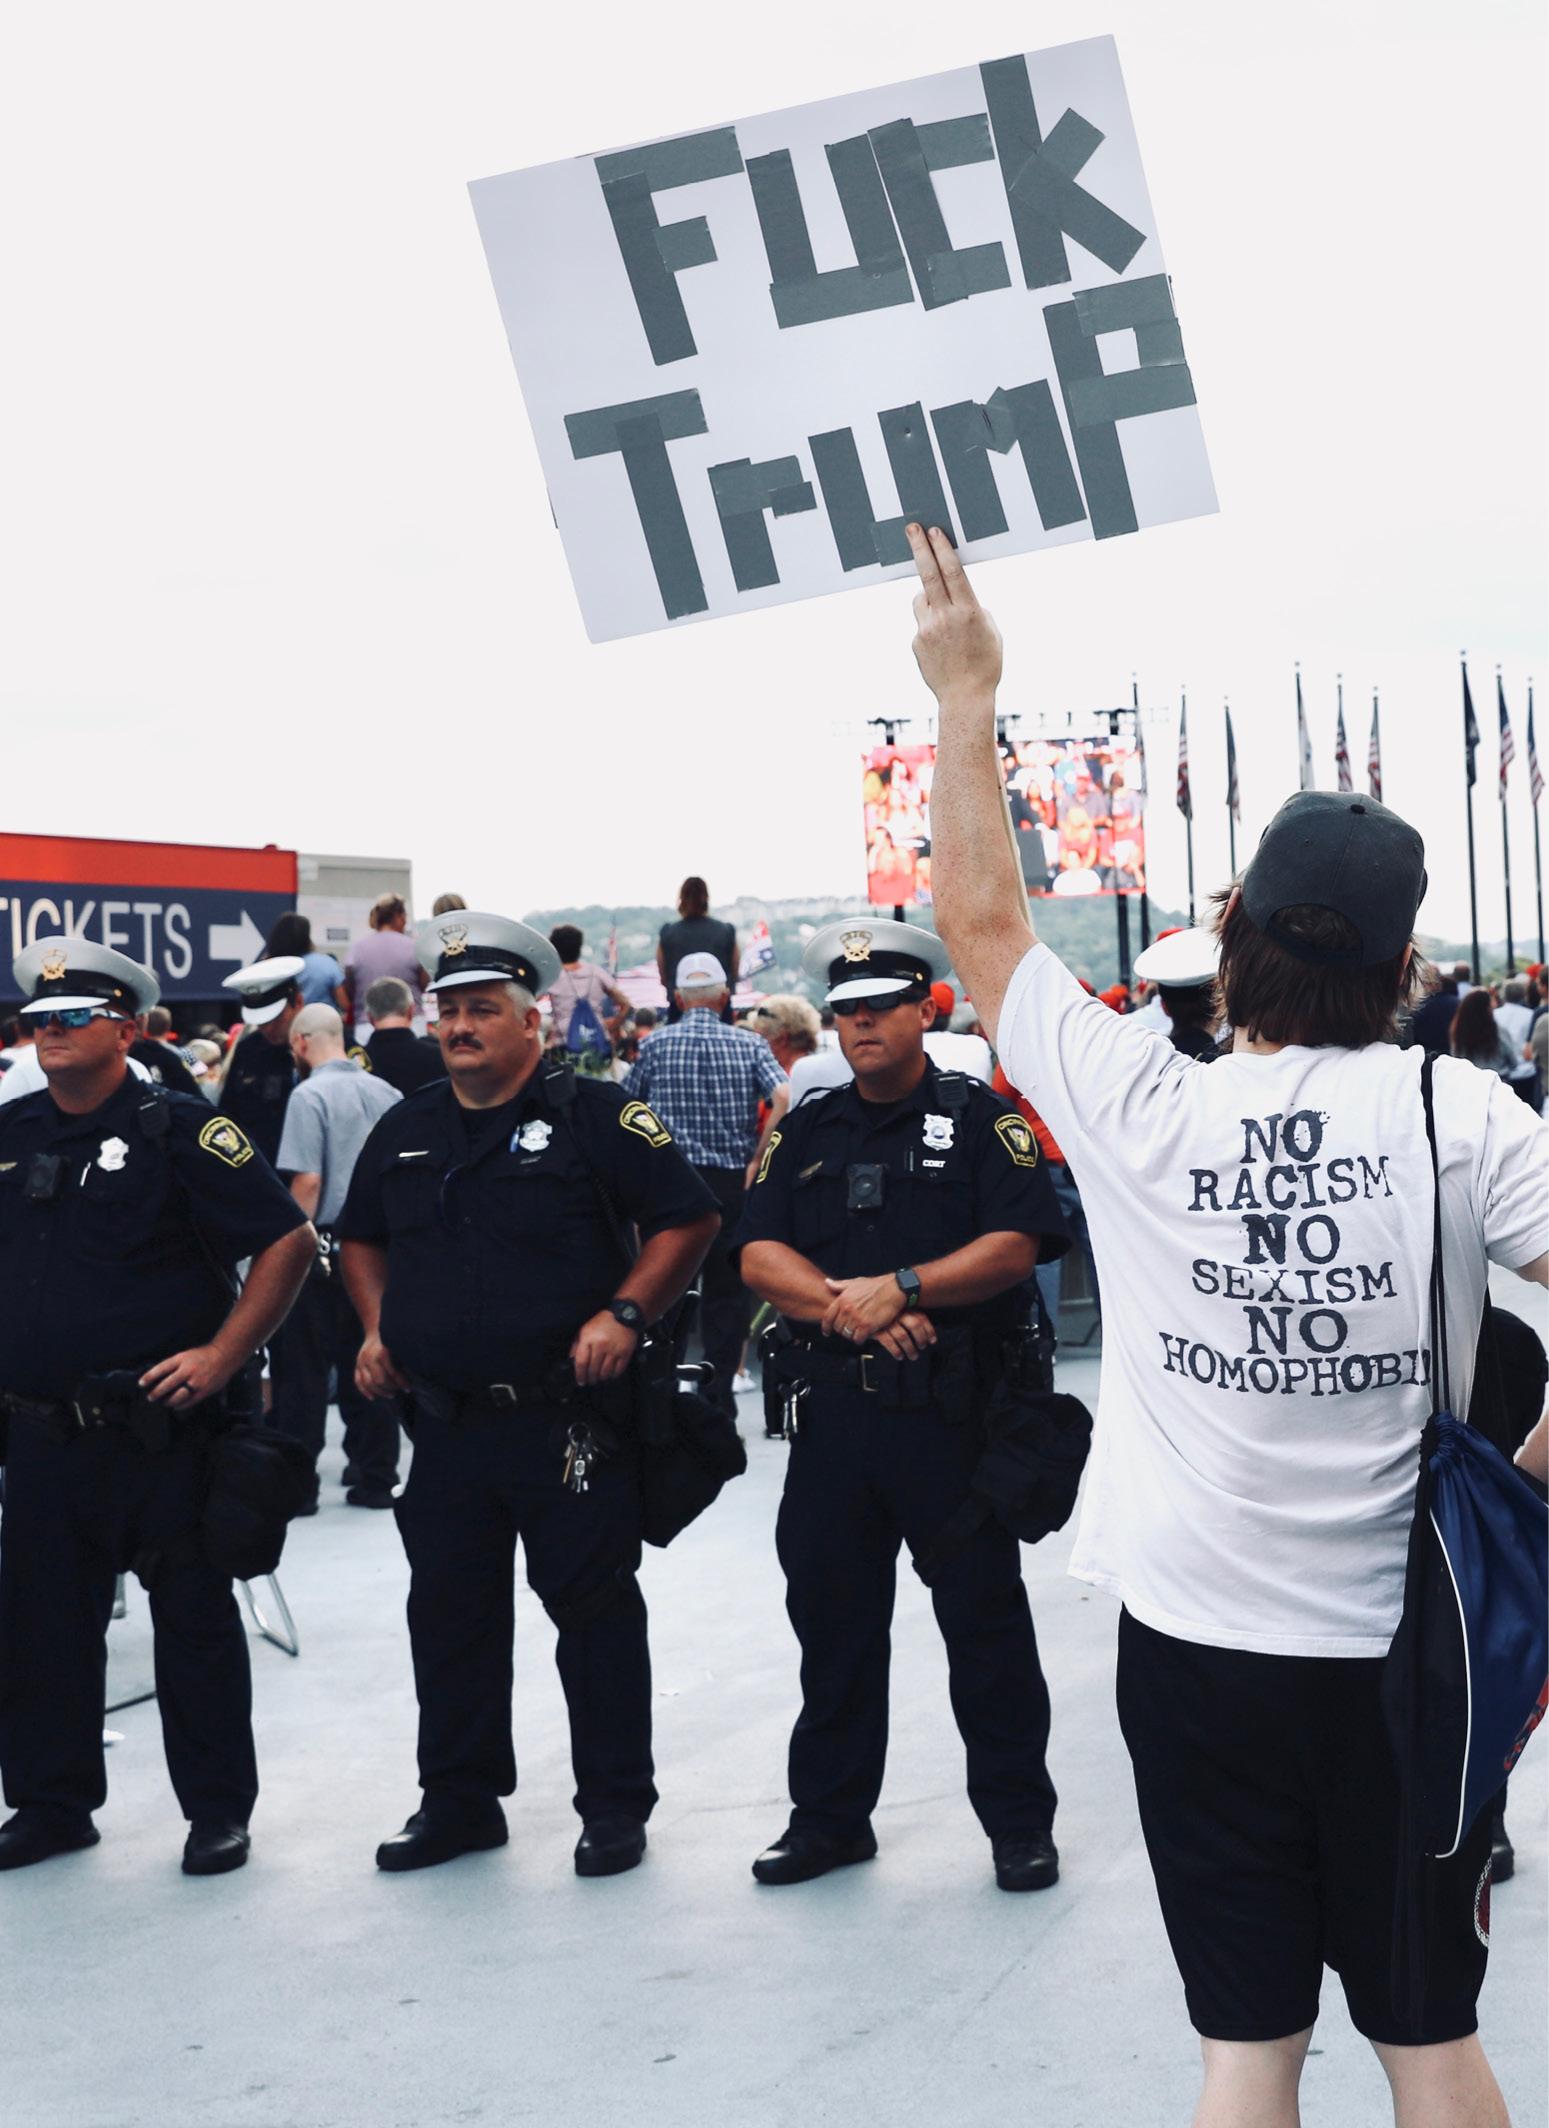 Andy Grant Trump Rally 8.1.19 - II28.jpg